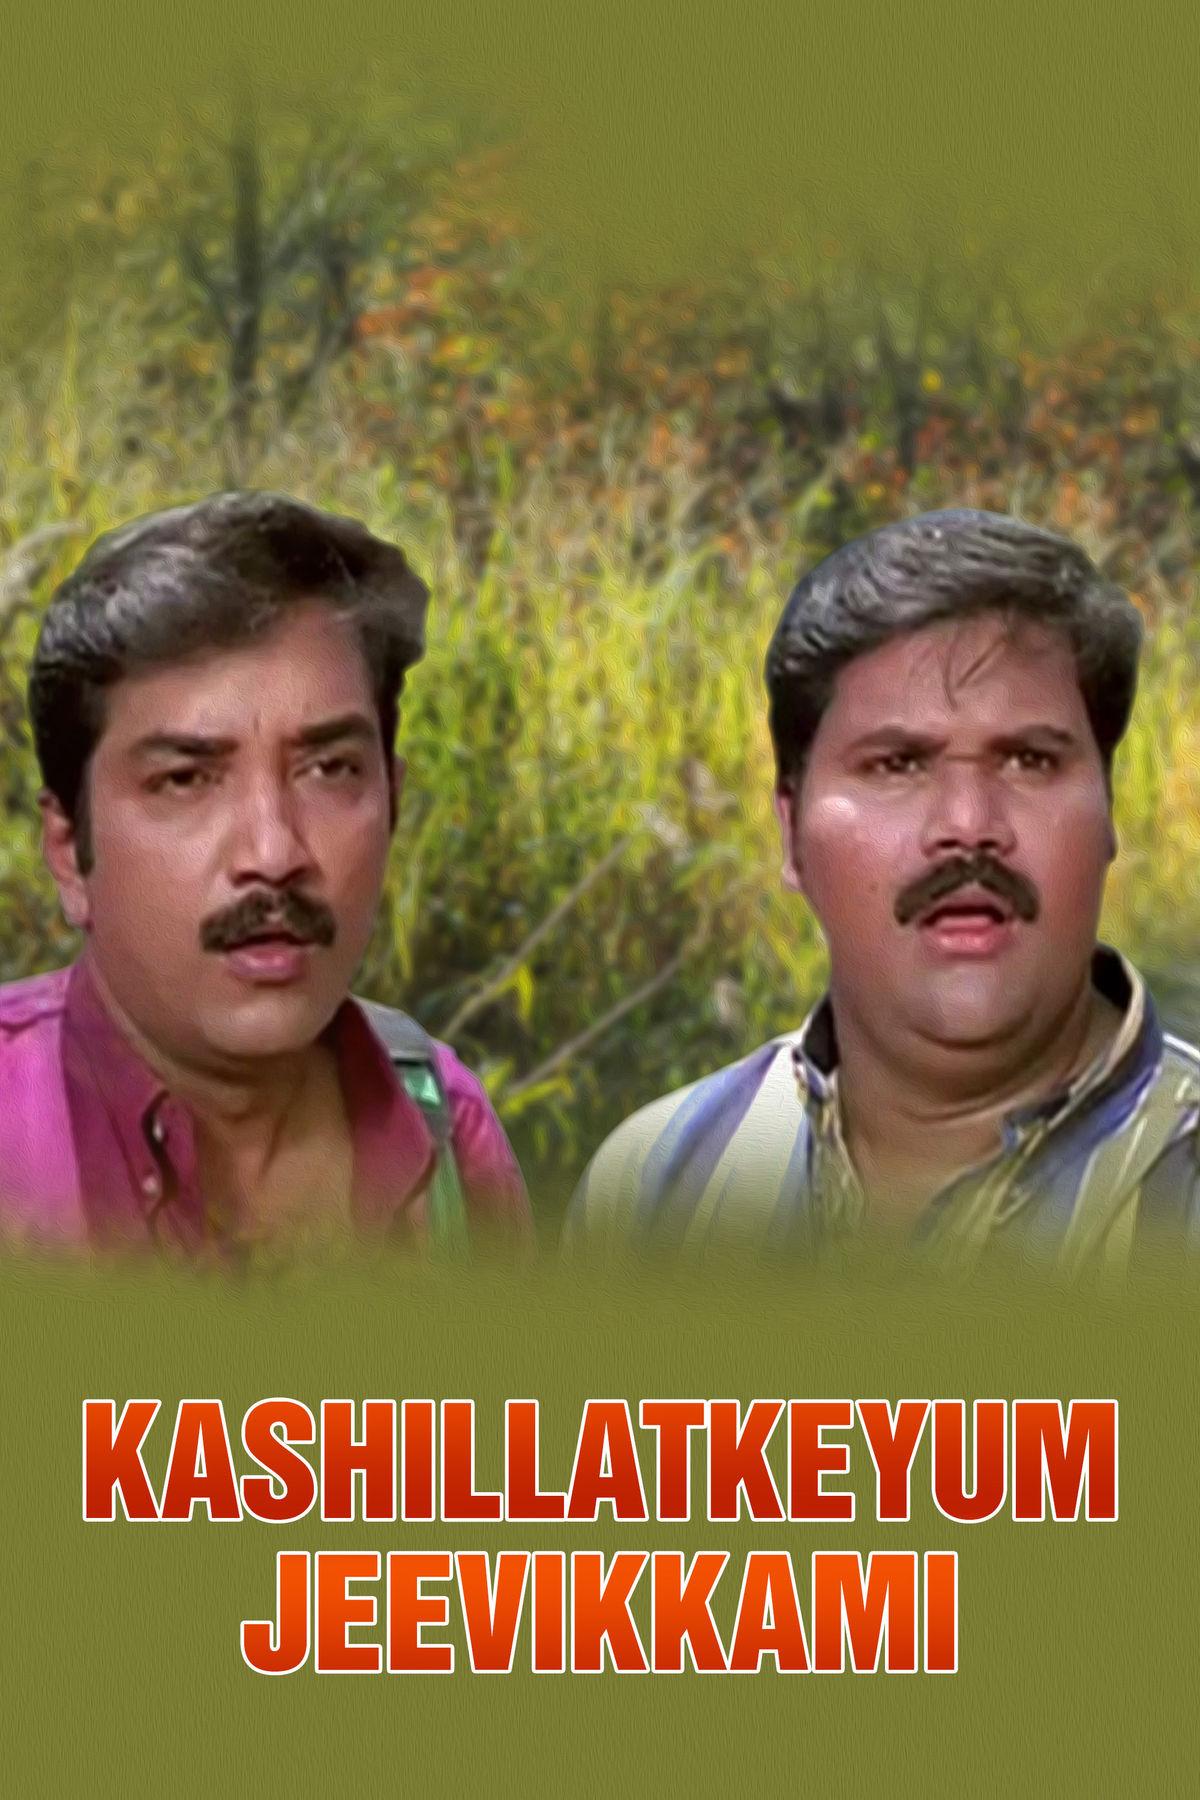 Kashillatheyum Jeevikkam